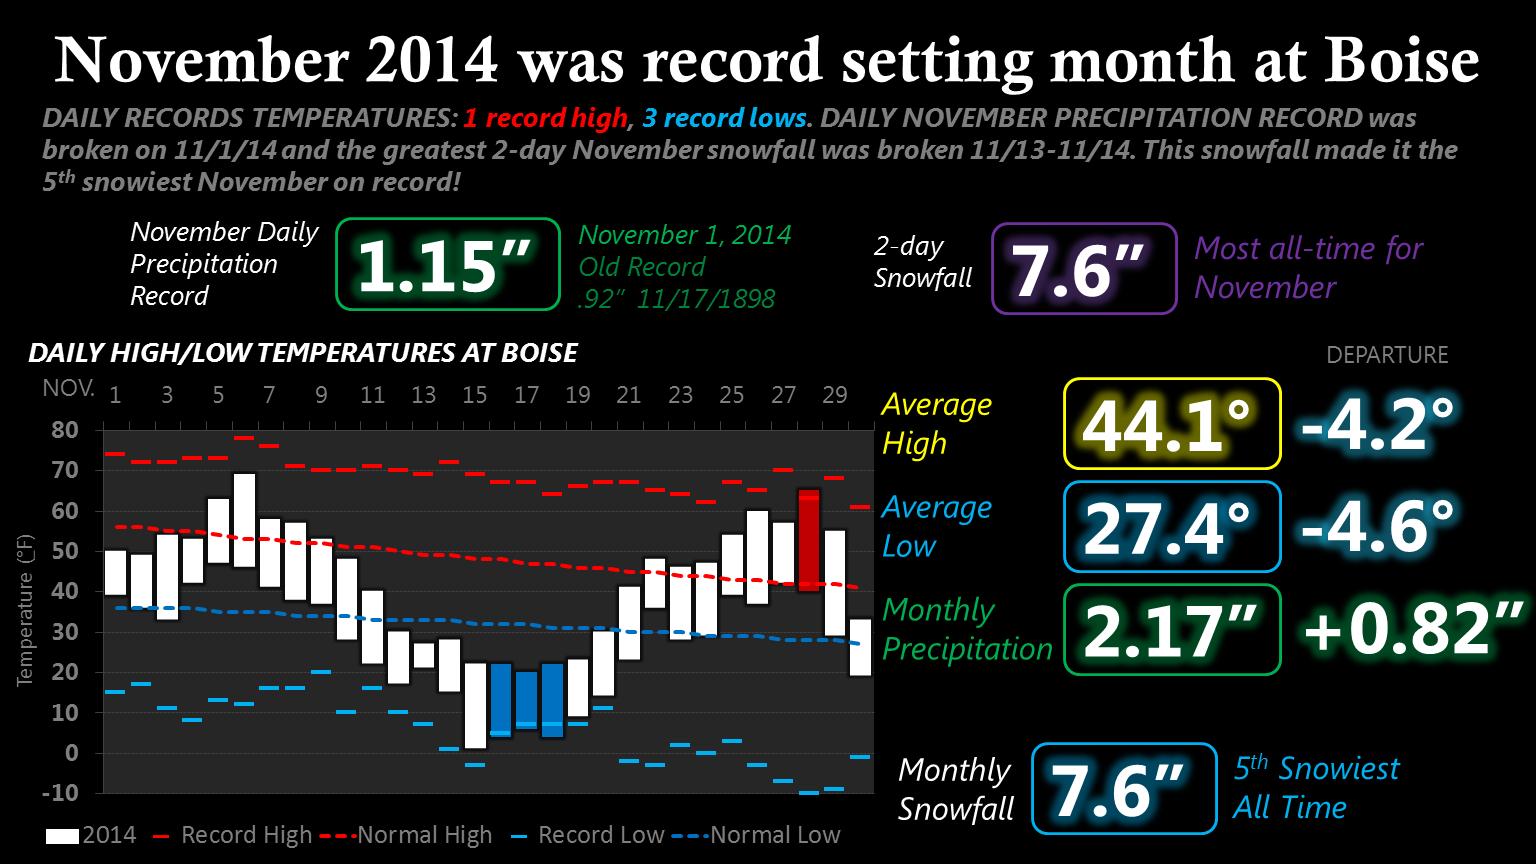 November 2014 Climate Stats for Boise